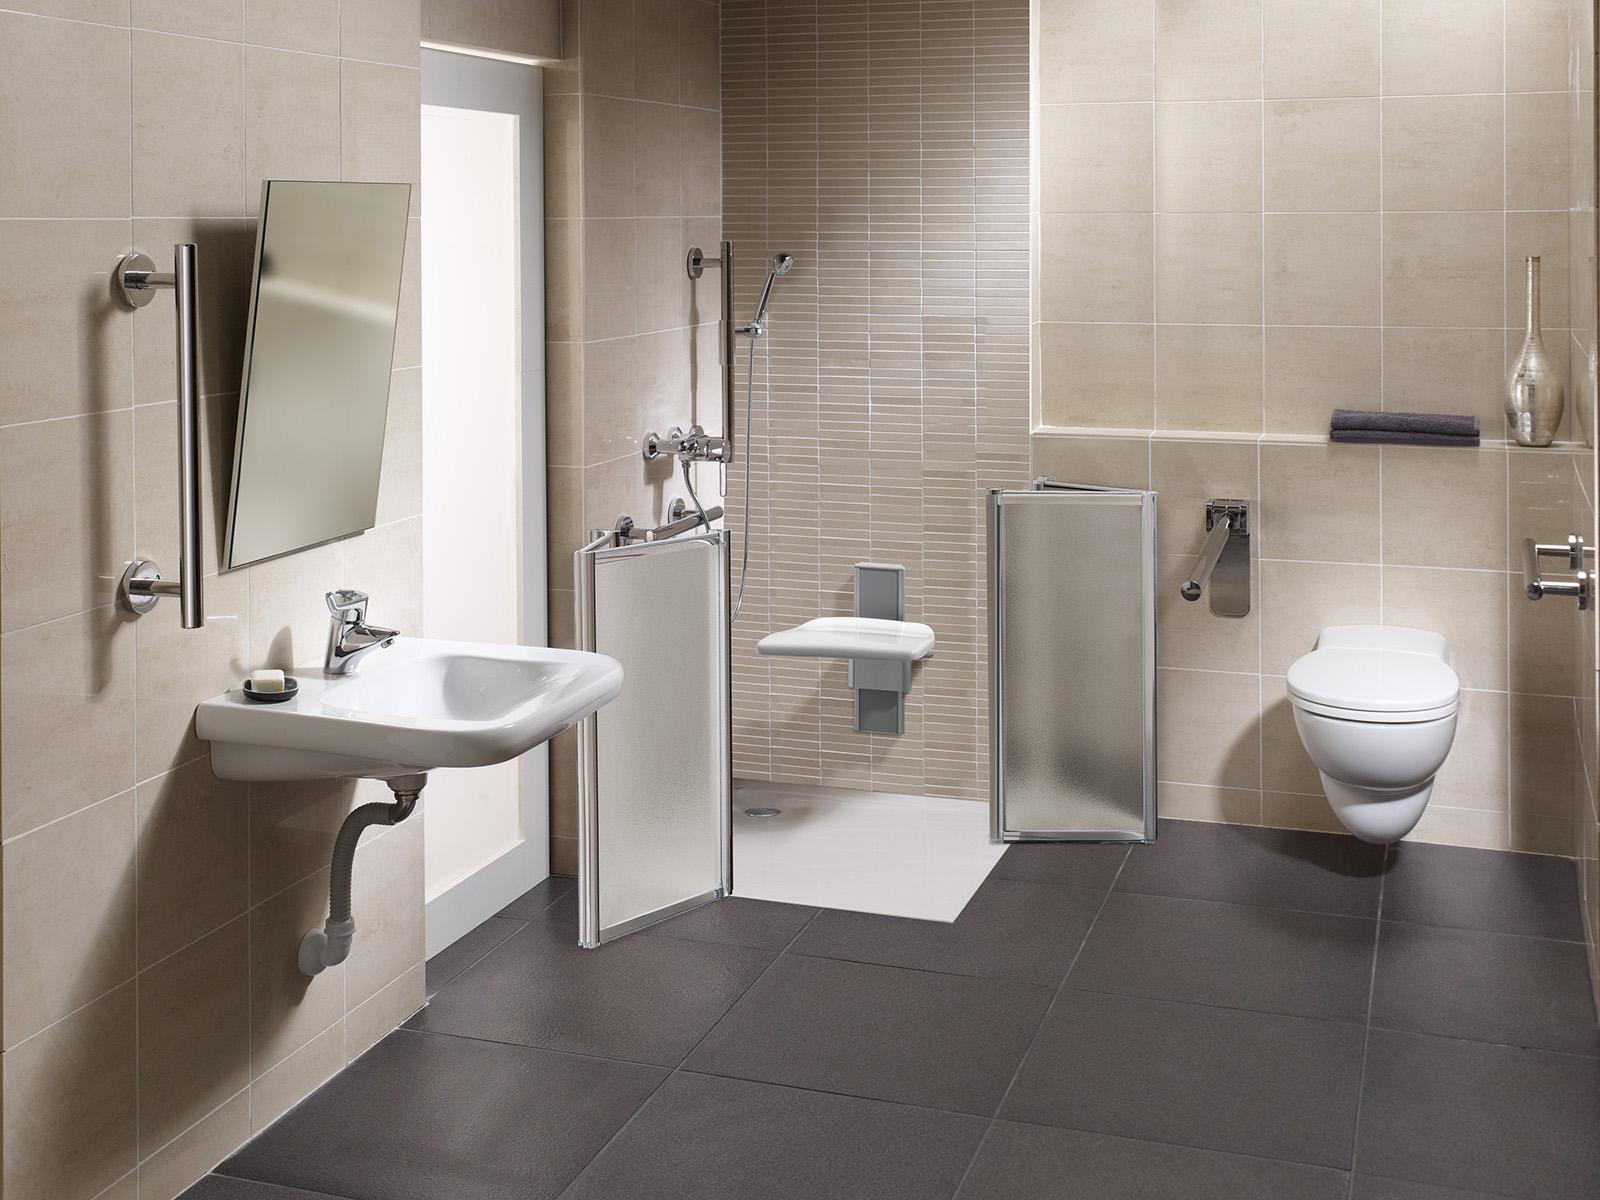 Bagni per disabili con doccia av regardsdefemmes